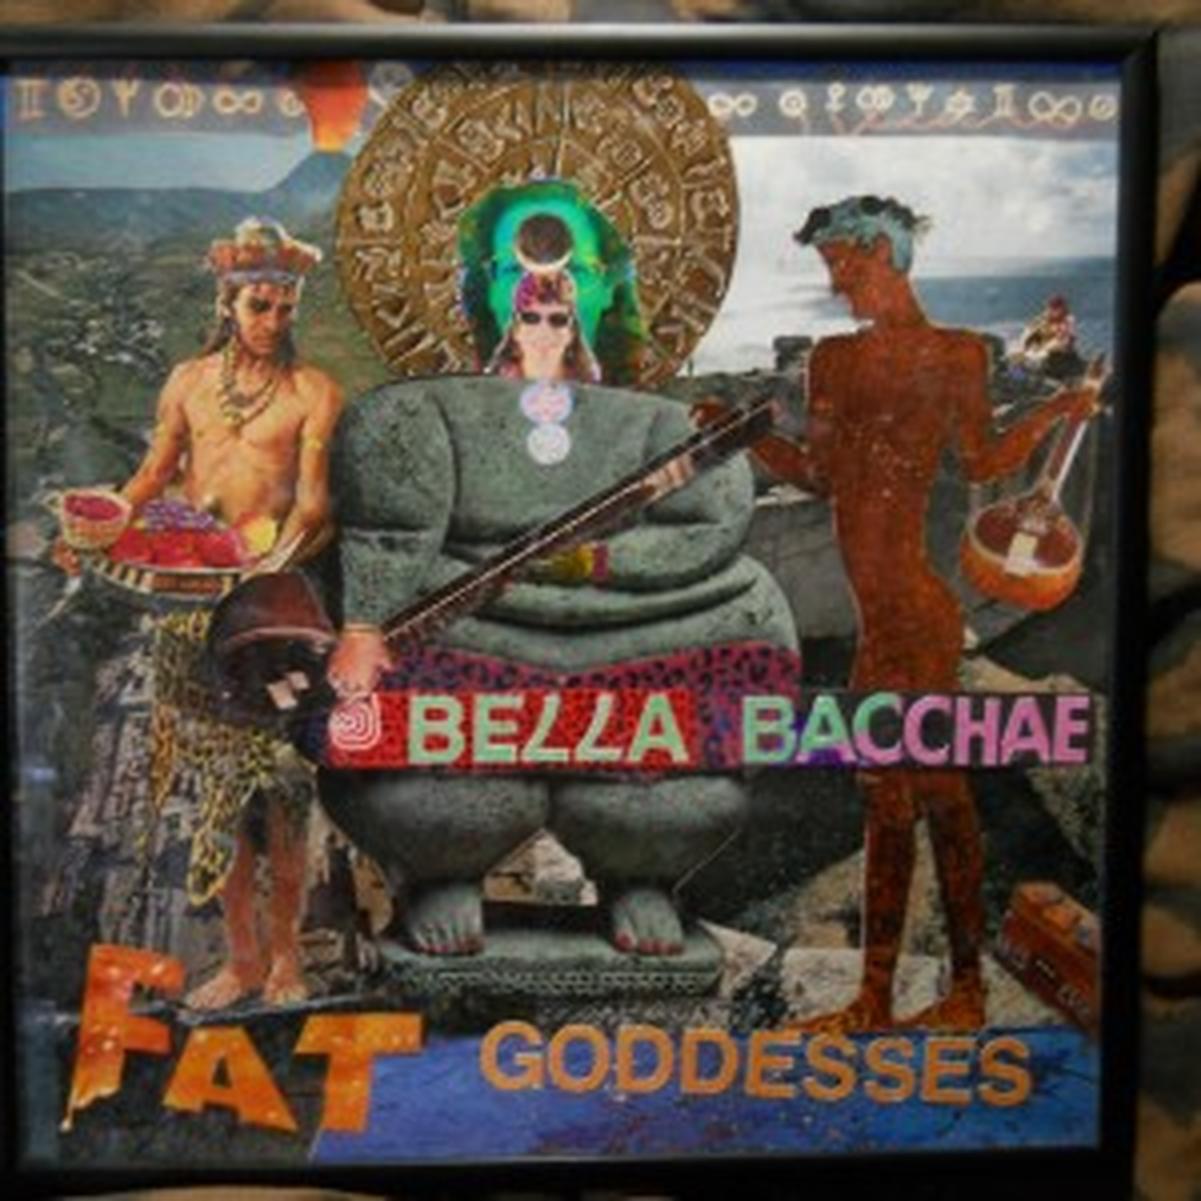 Bella Bacchae